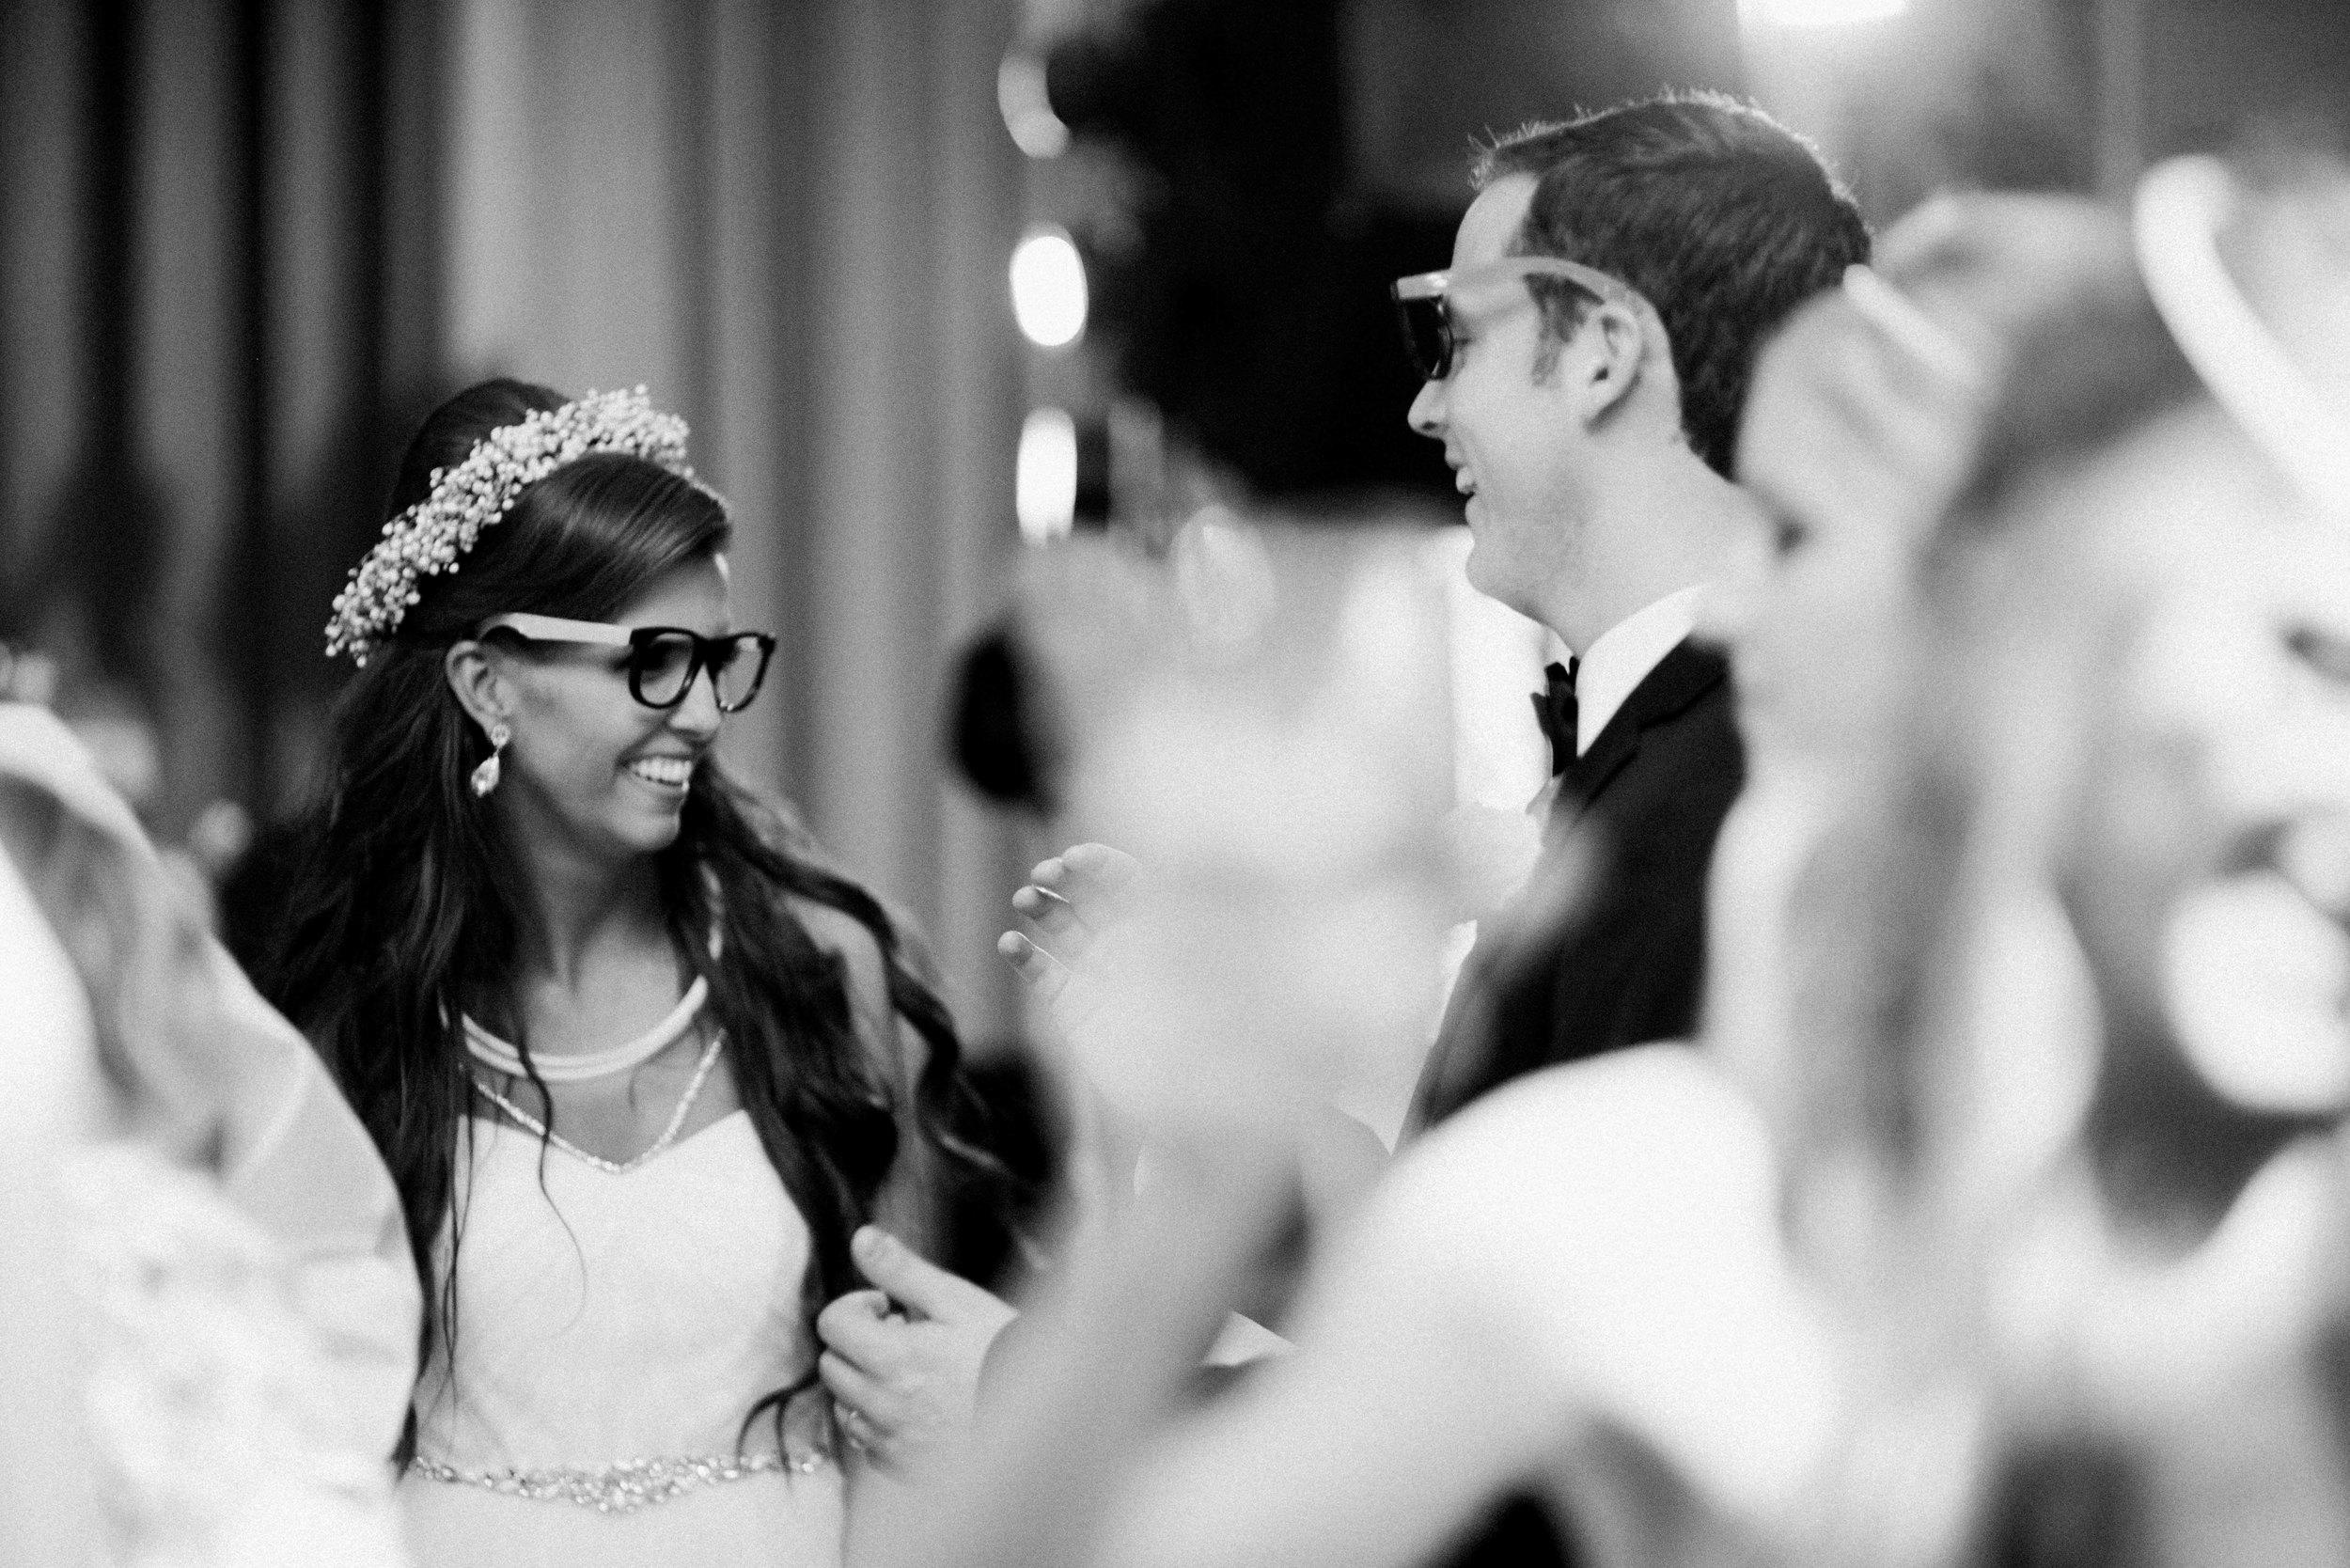 Dana-Fernandez-Photography-Weddings-in-Houston-Magazine-feature-Houston-wedding-photographer-film-43.jpg